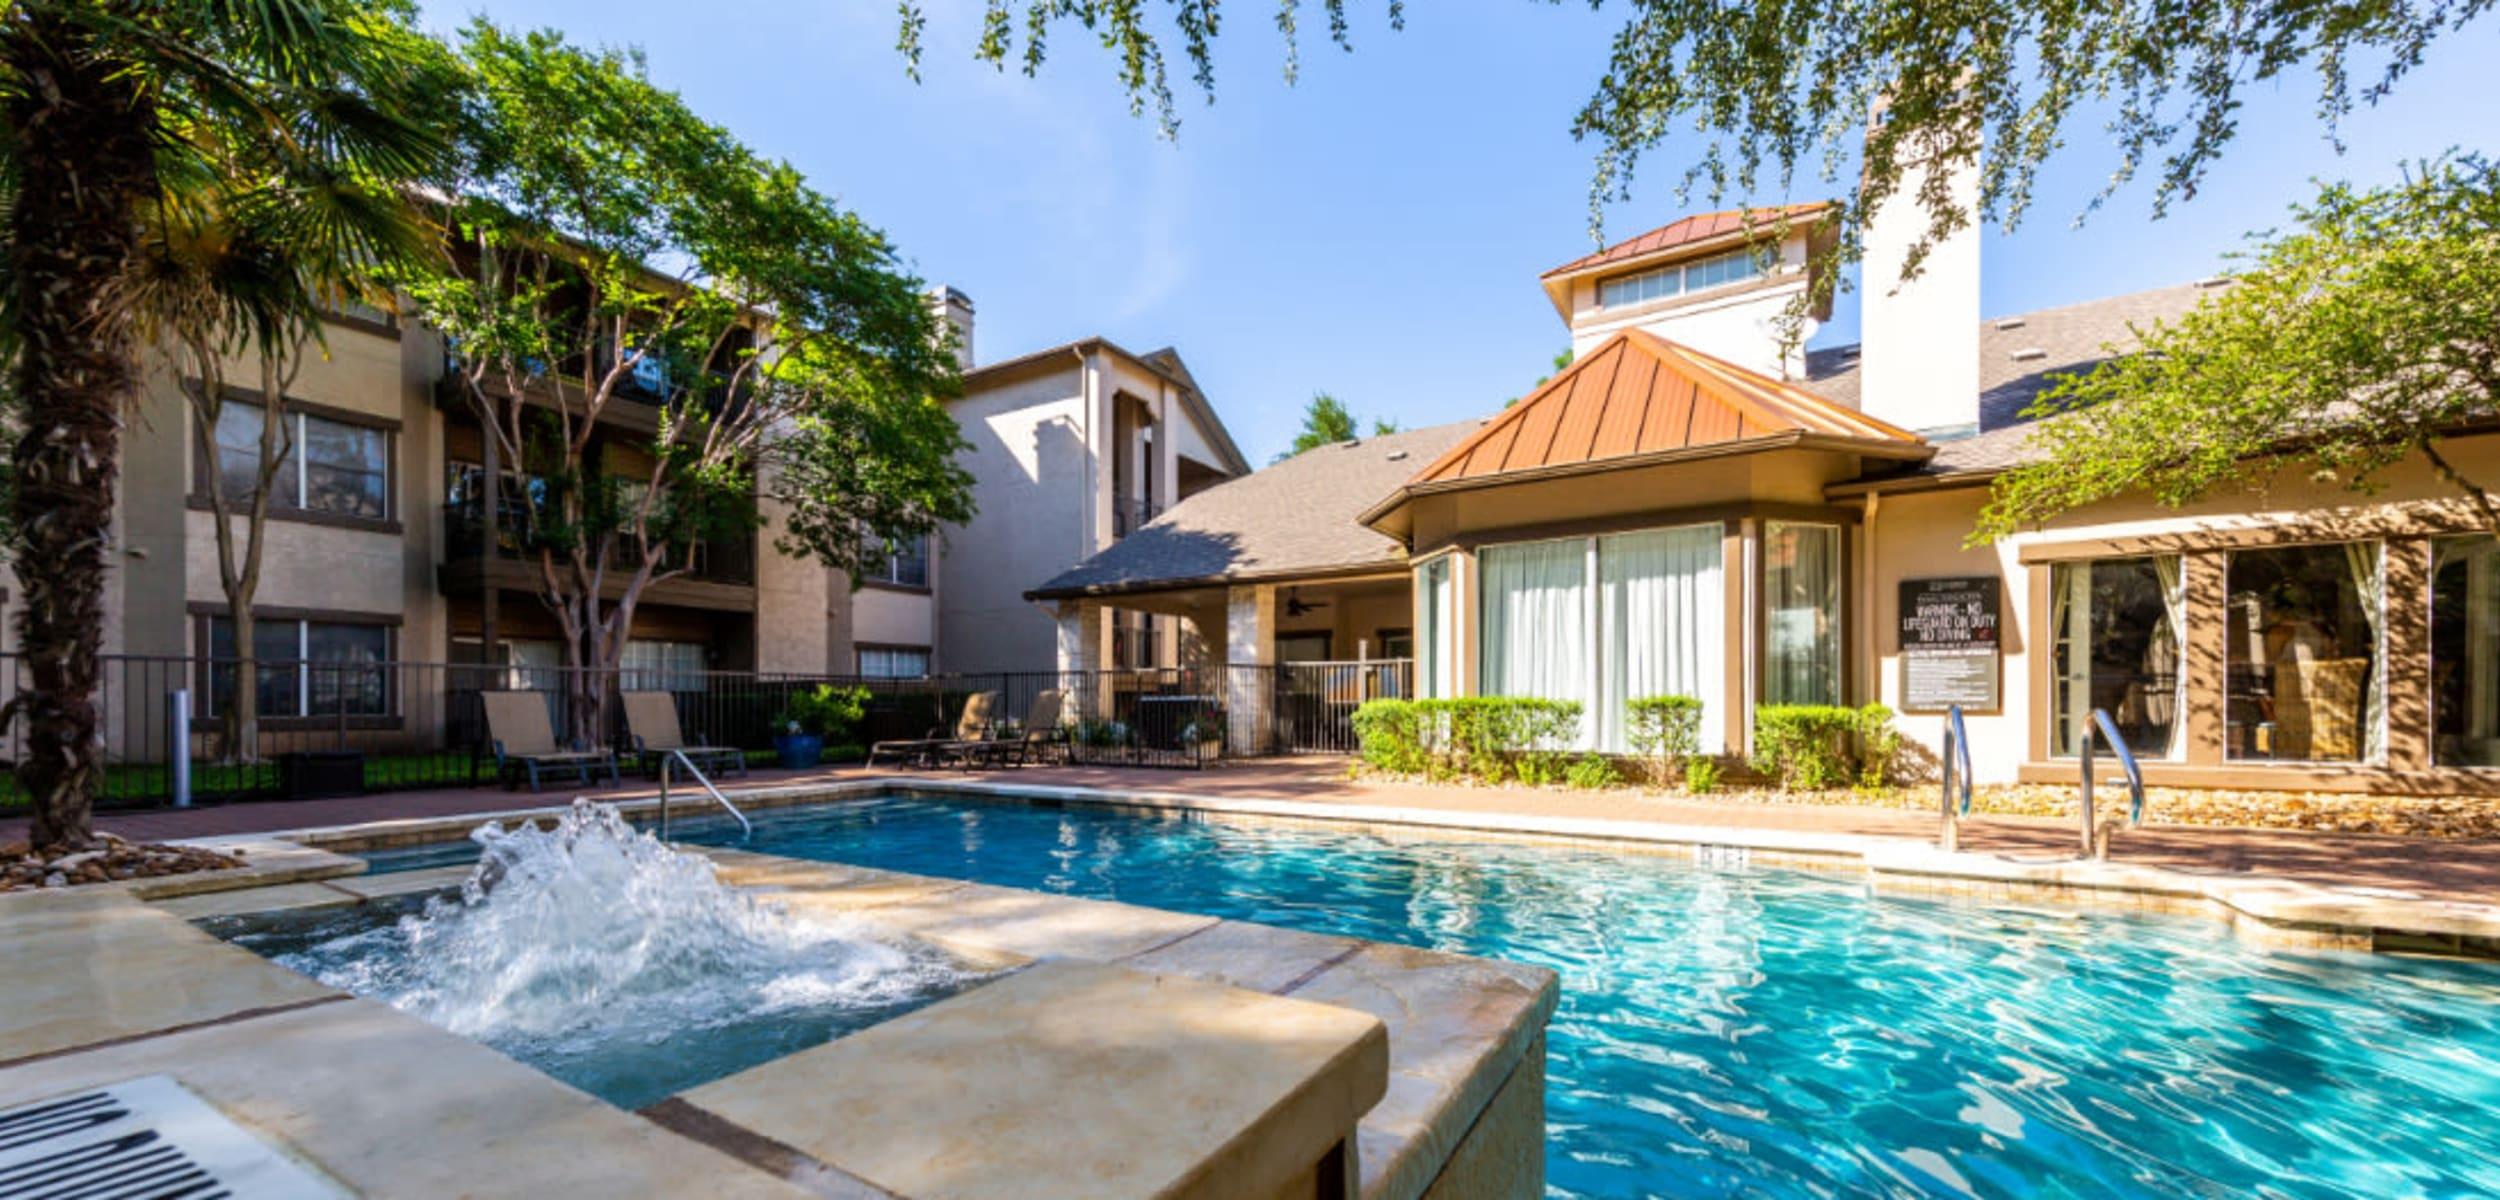 Sparkling pool at Marquis at Ladera Vista in Austin, Texas